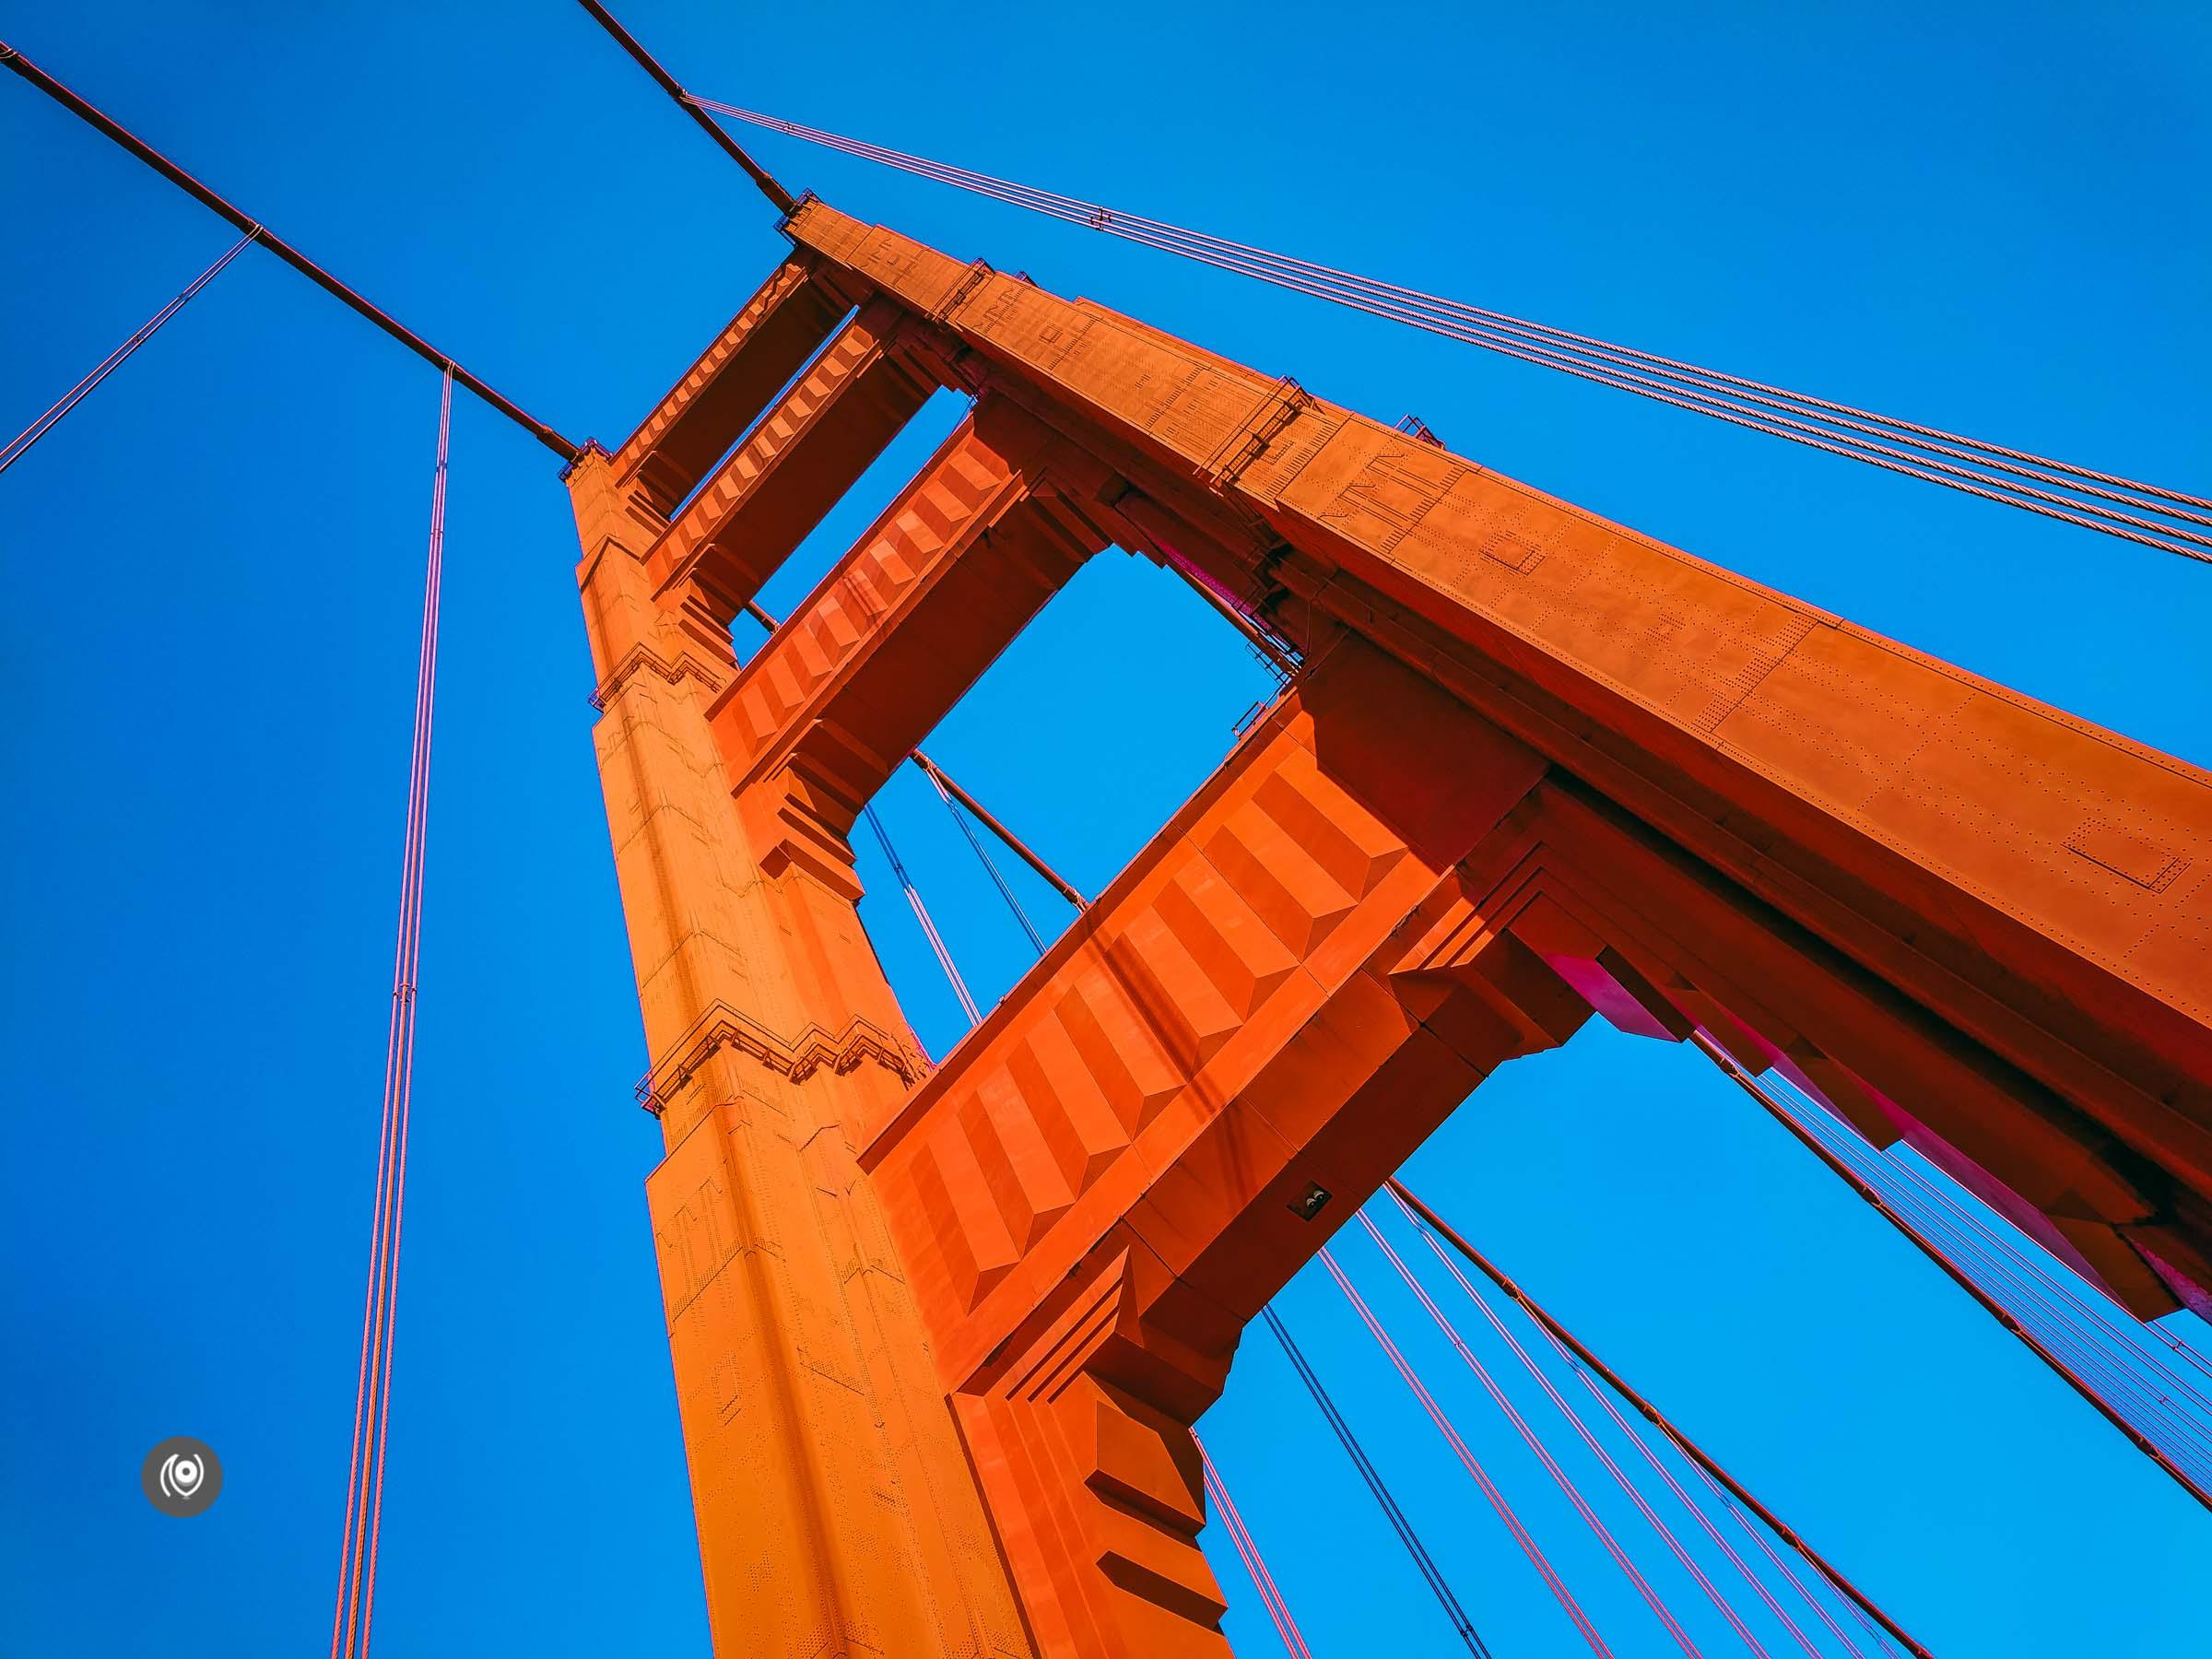 Naina.co, Golden Gate Bridge, San Francisco, Bay Bridge, San Francisco Bay, NAINAxGoogle, EyesForDesinations, EyesForSF, Travel Photographer, Travel Blogger, Lifestyle Photographer, Lifestyle Blogger, Naina Redhu, Professional Photographer, Professional Blogger, Alcatraz, Travel, USA, America